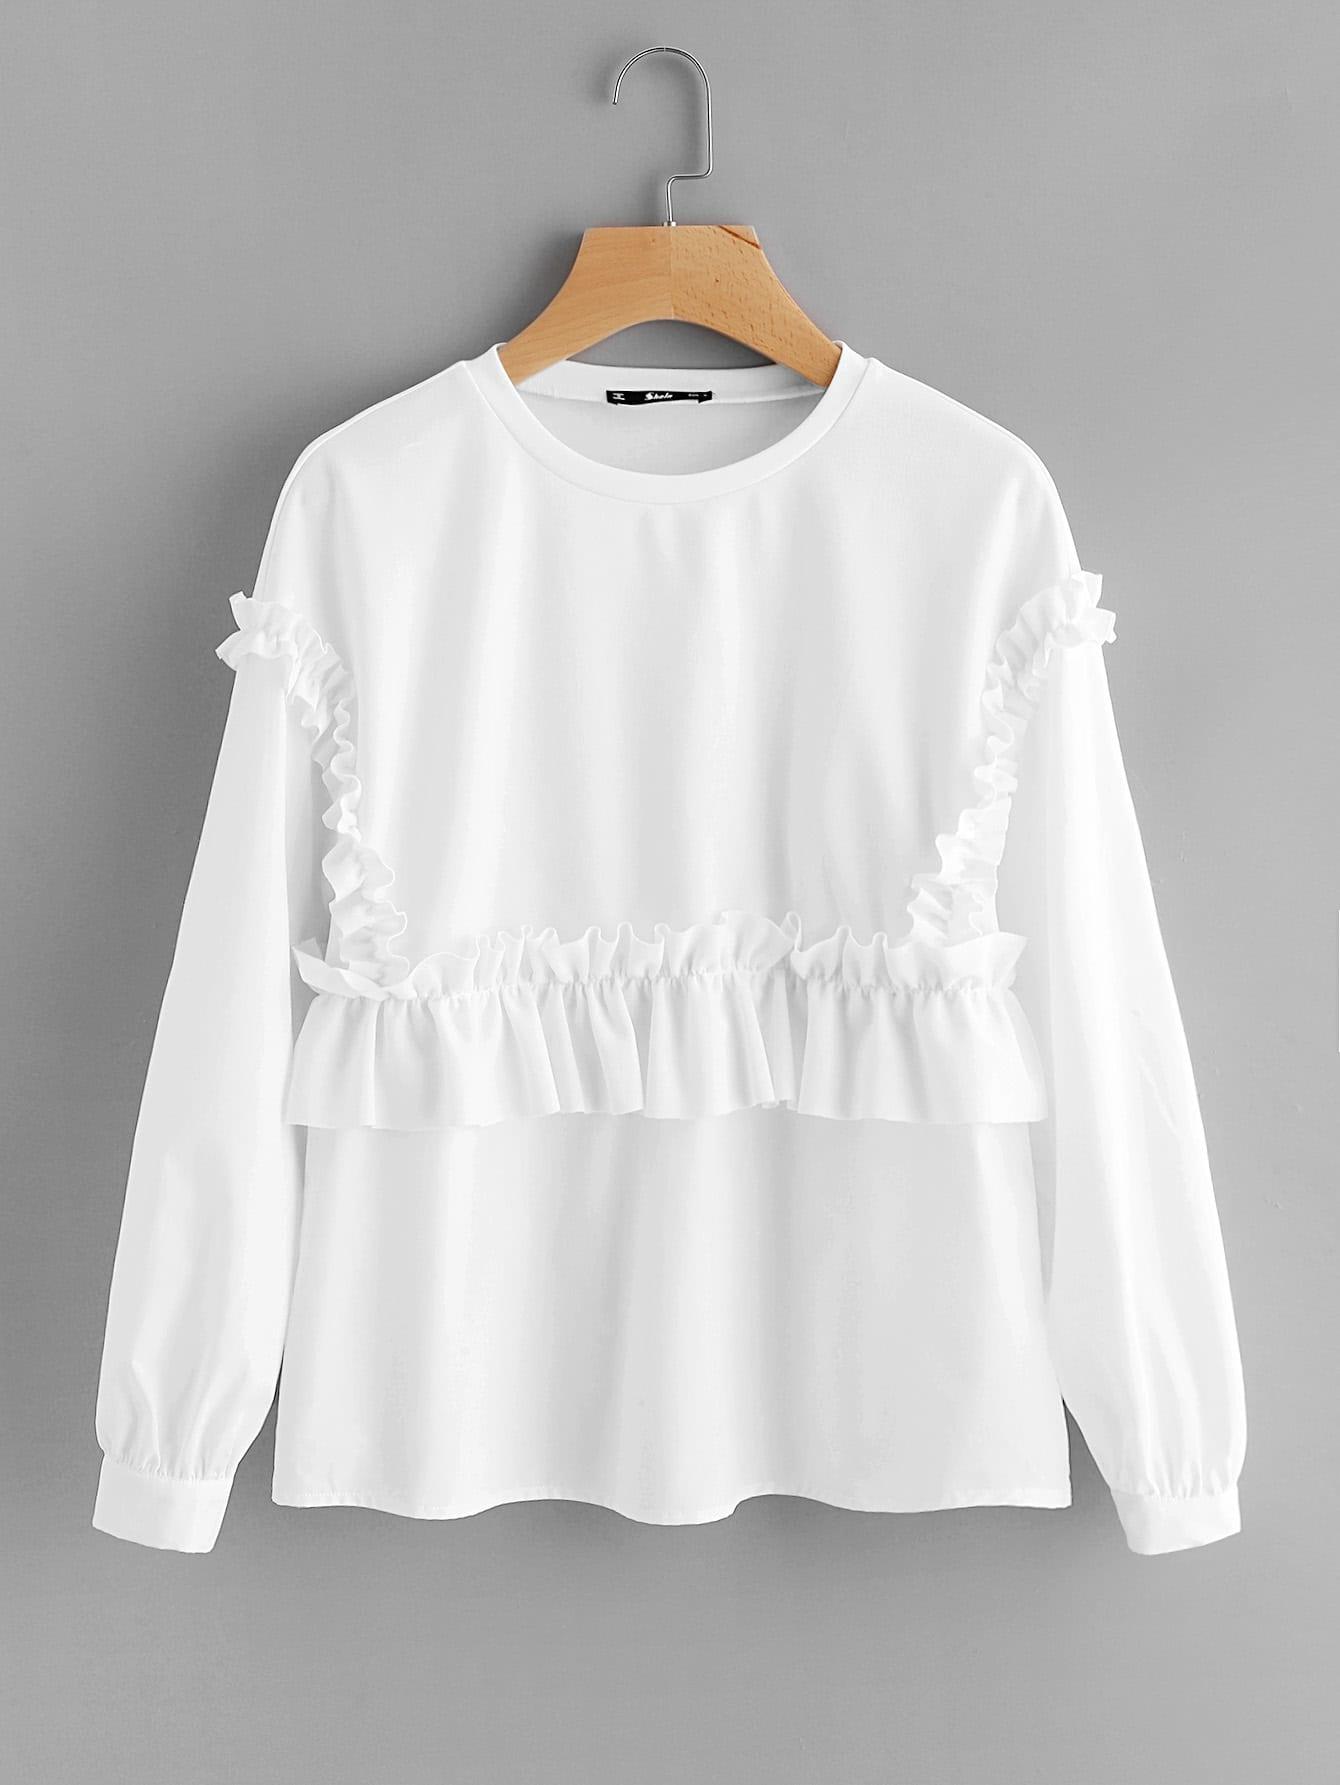 Shirred Frill Embellished Sweatshirt frill sleeve tape detail sweatshirt